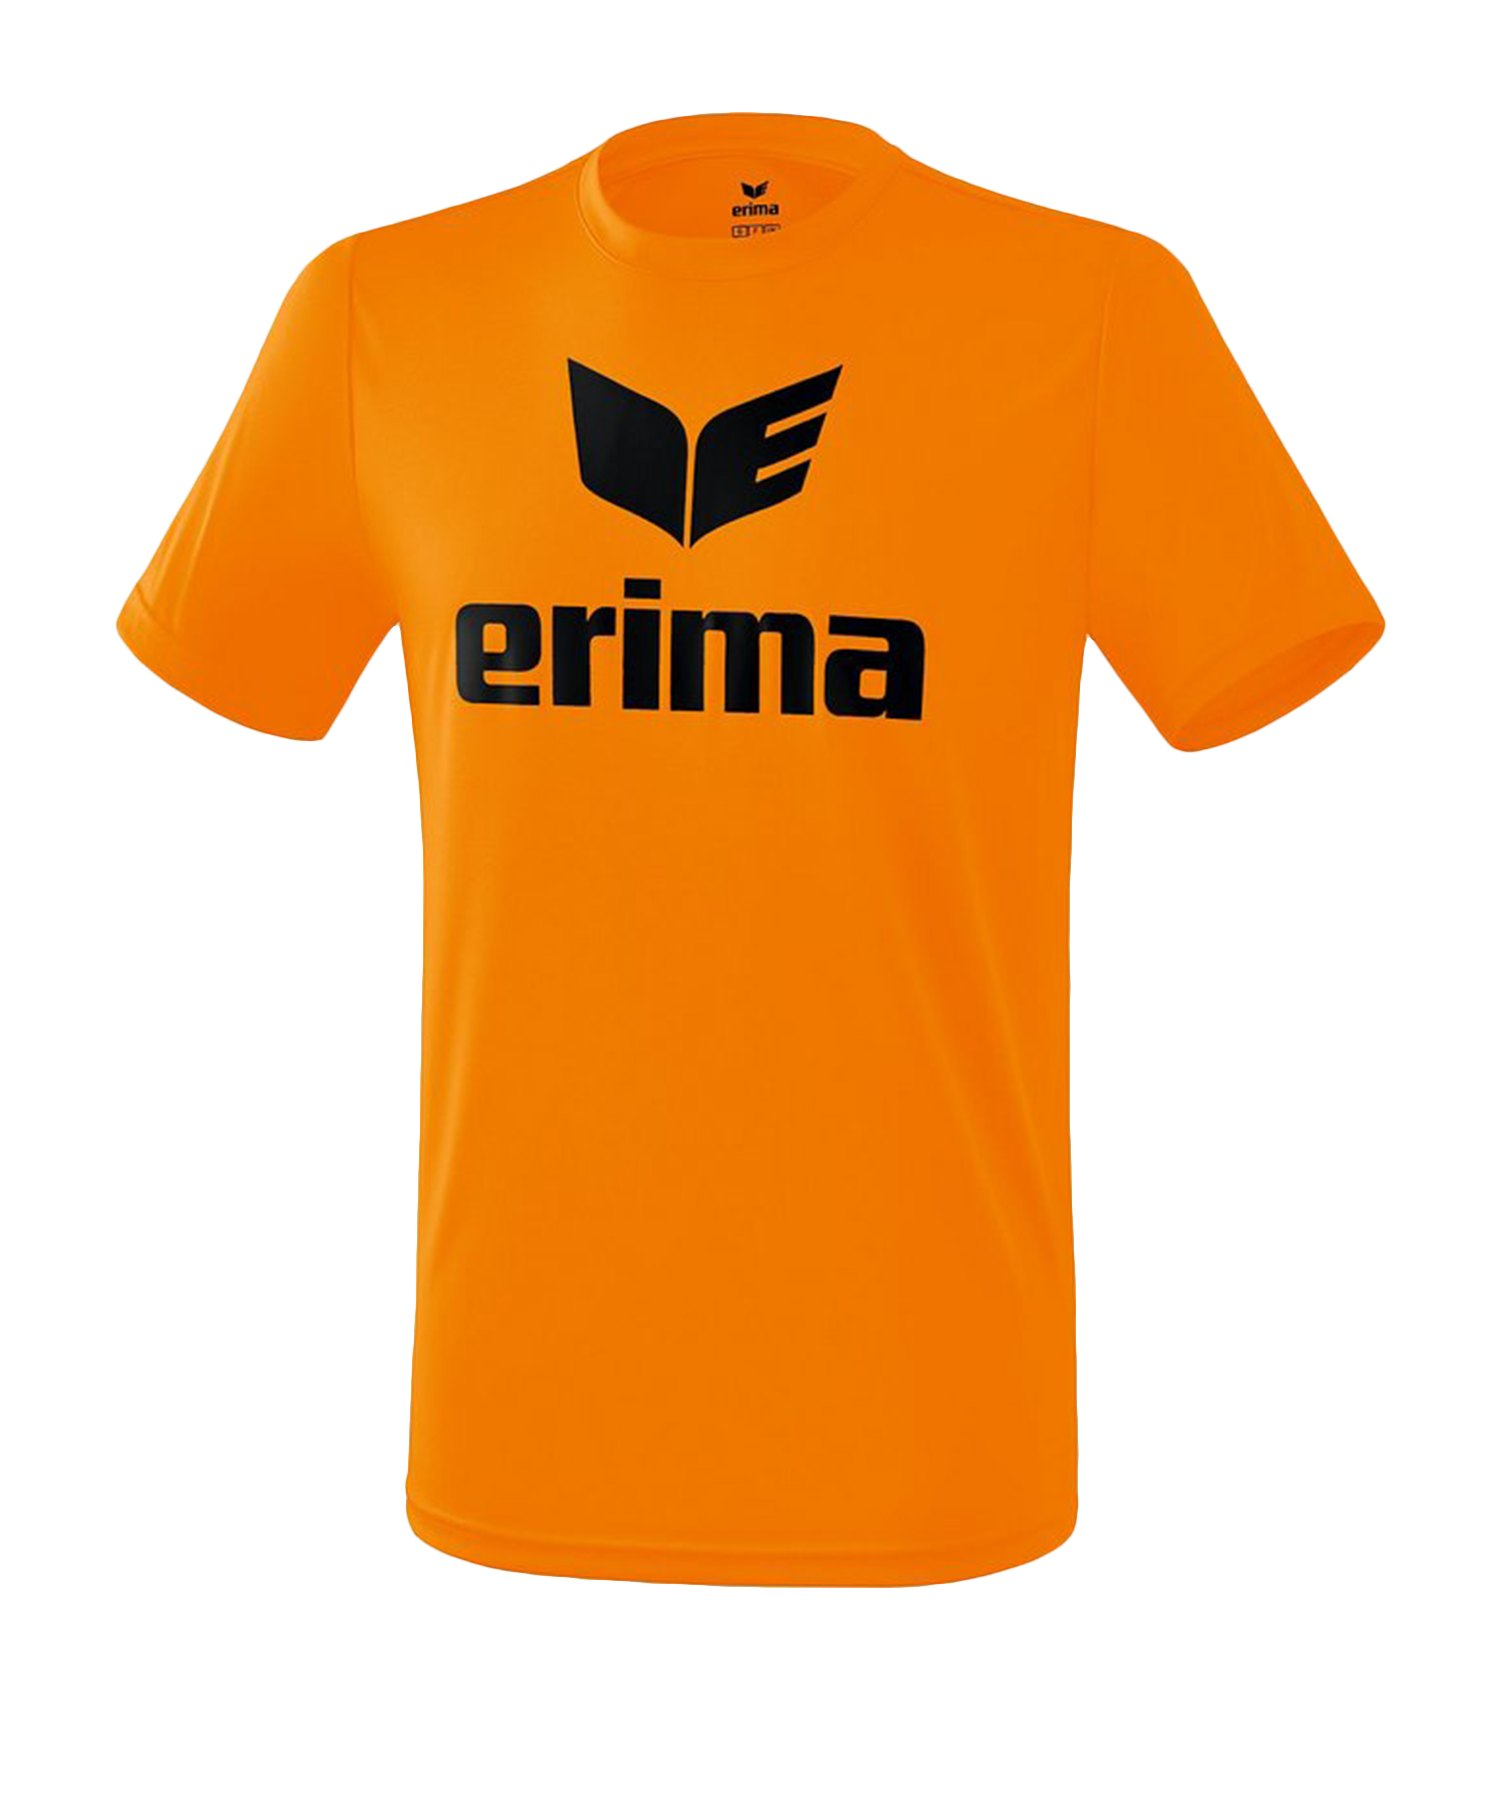 Erima Funktions Promo T-Shirt Orange Schwarz - Orange